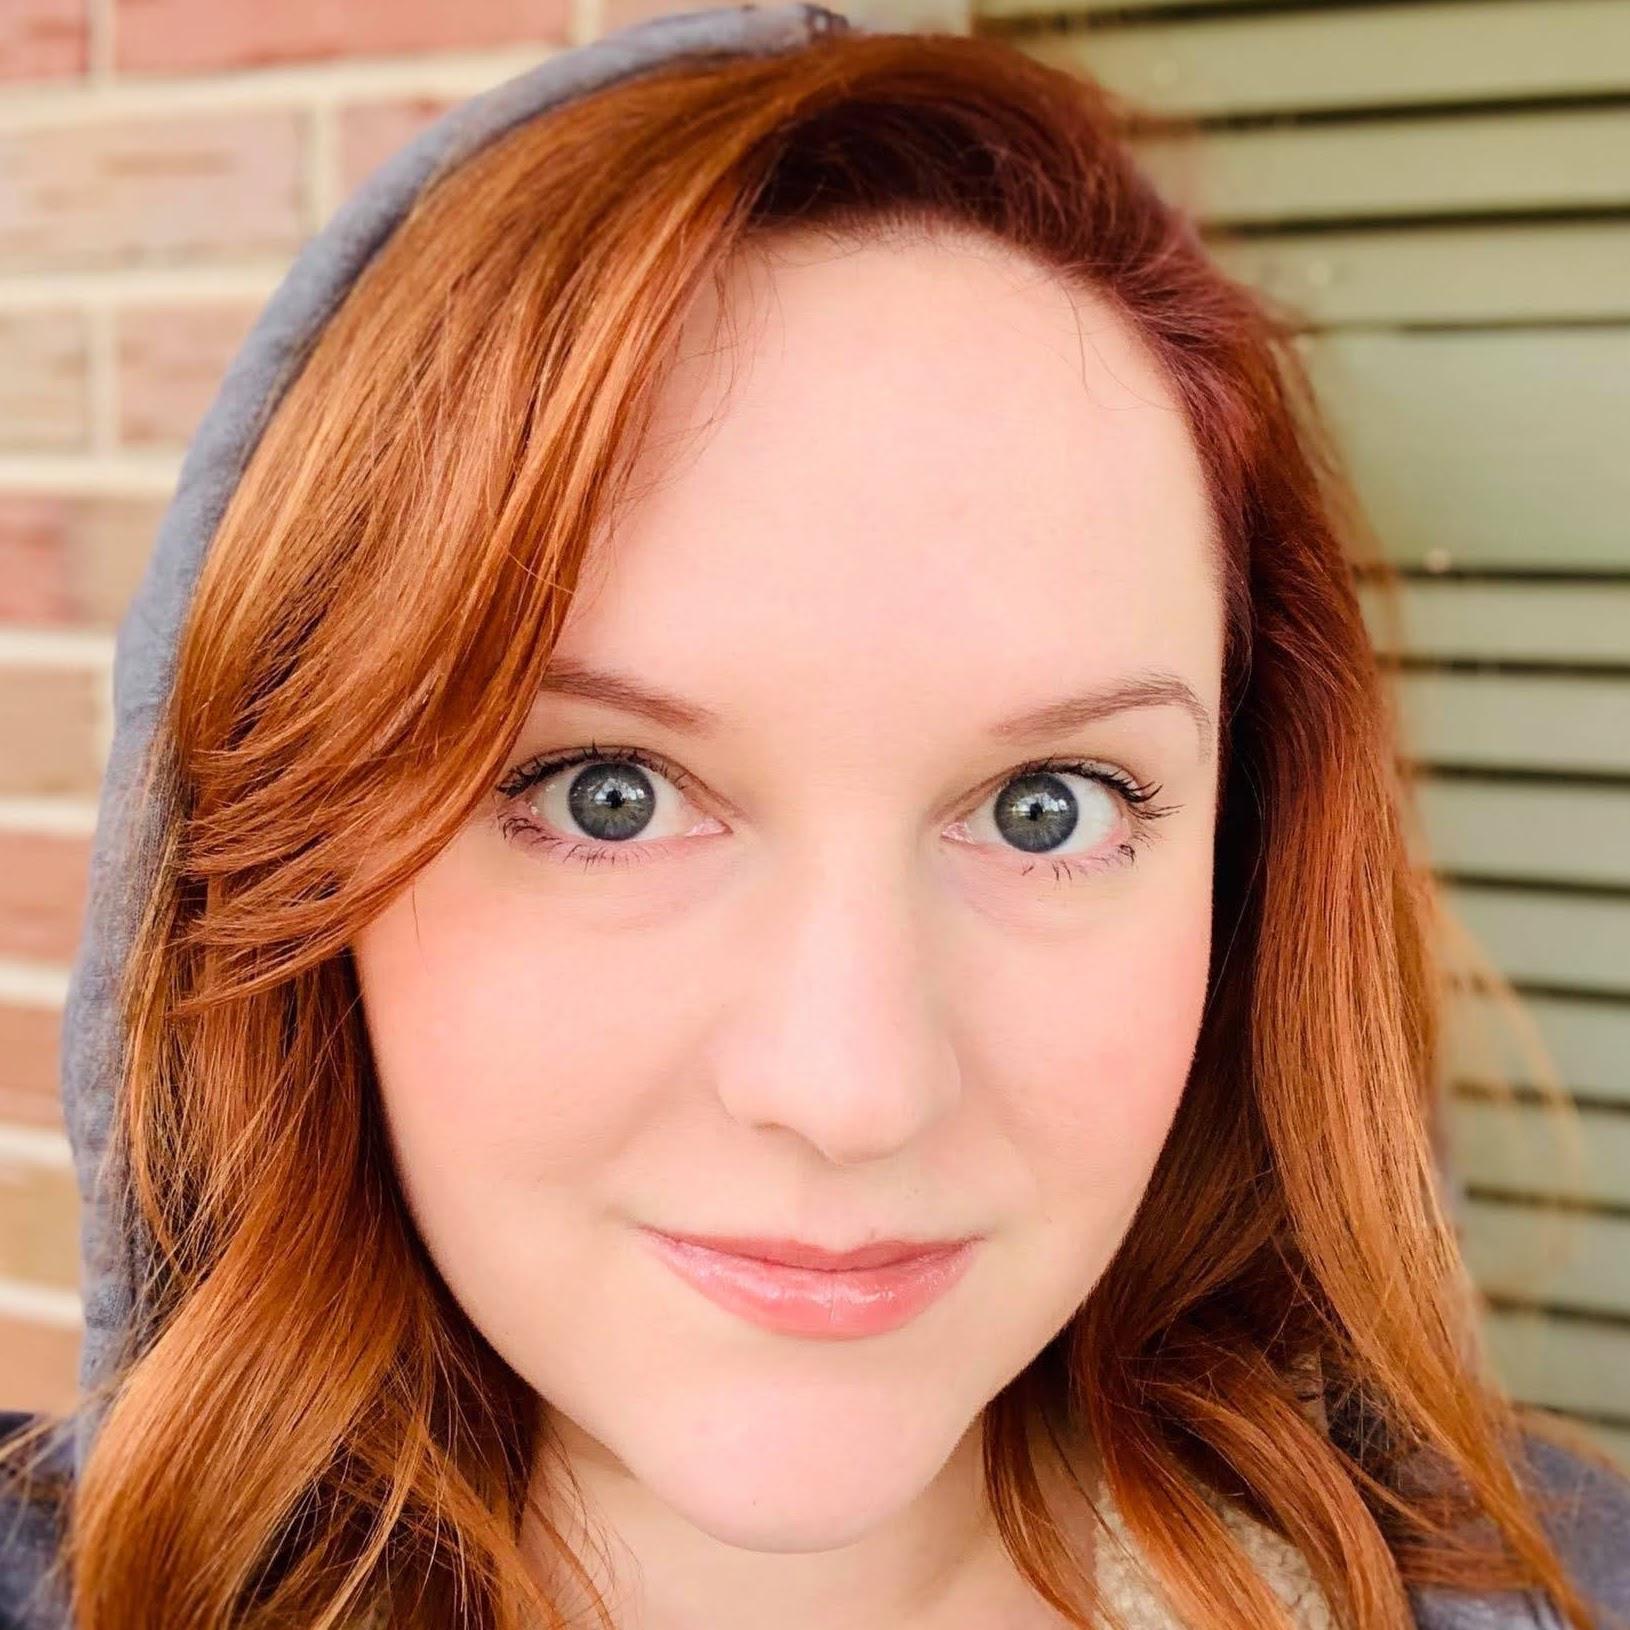 Heather Bazal